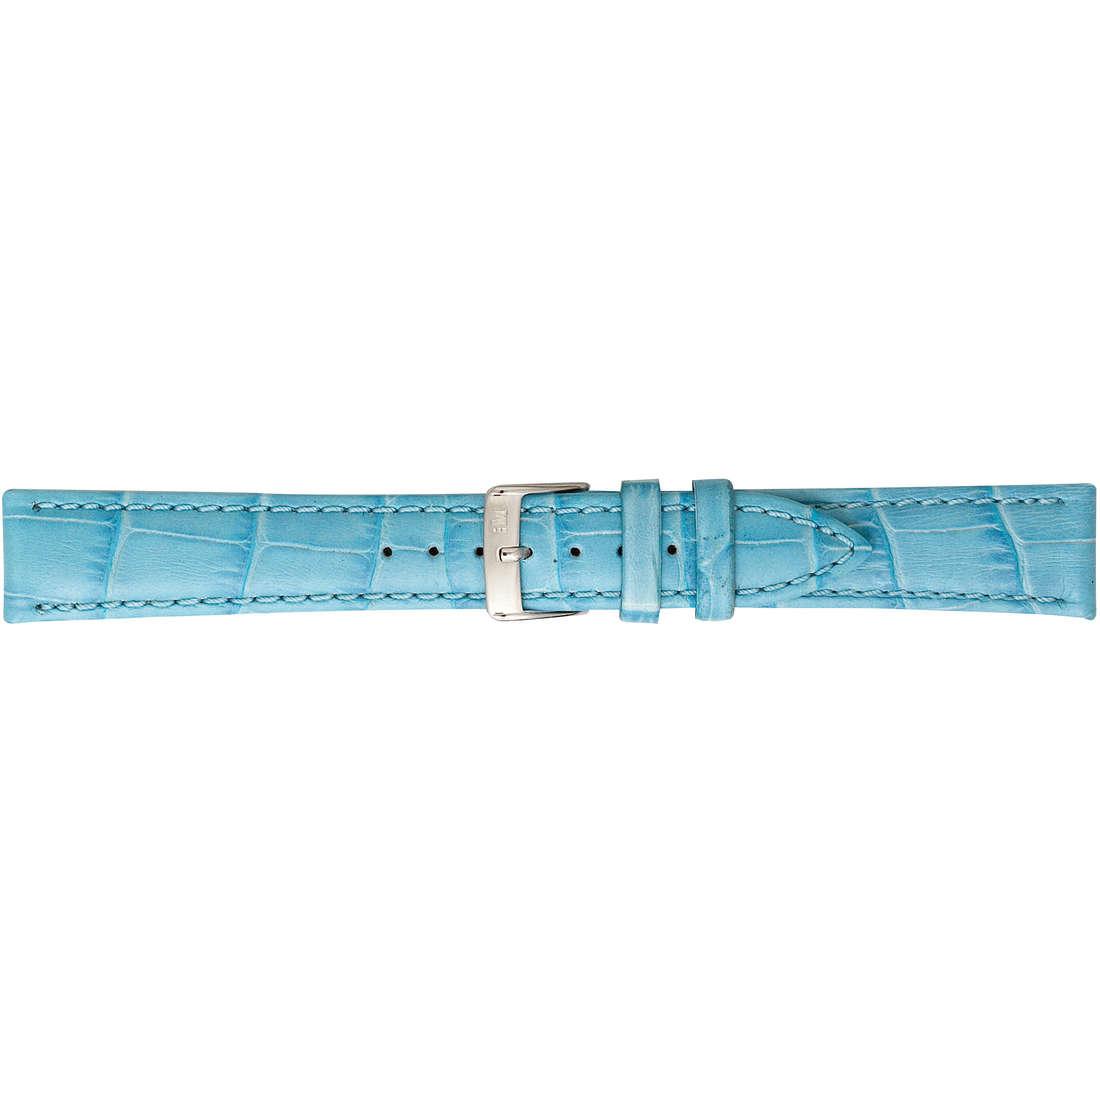 watch watch bands watch straps man Morellato Morellato 1930 A01X2269480168CR14